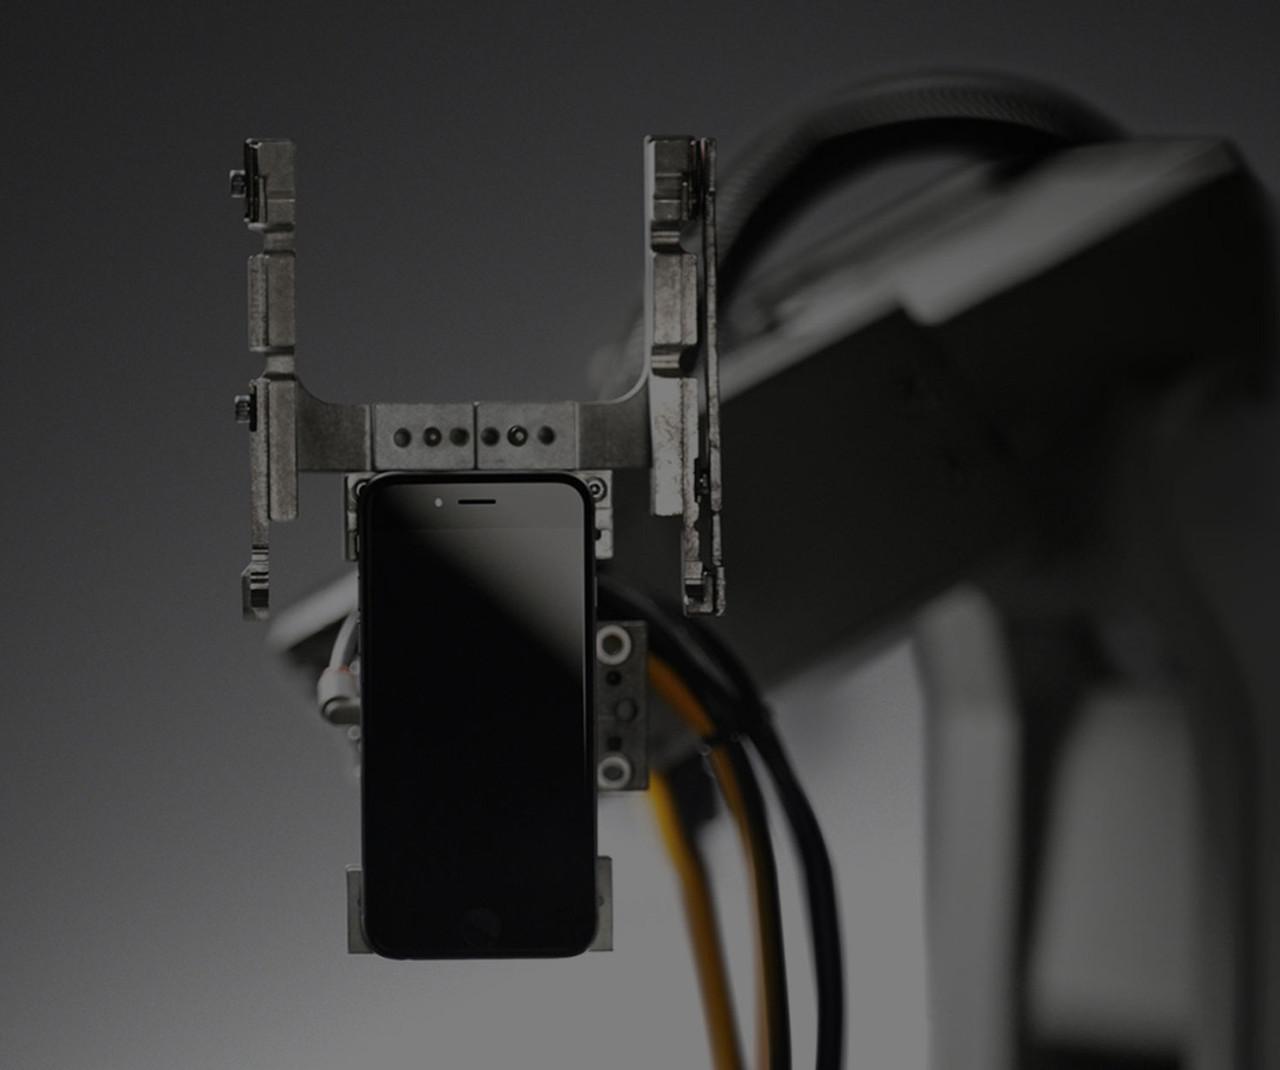 Meet Liam, Apple's iPhone Recycling Robot